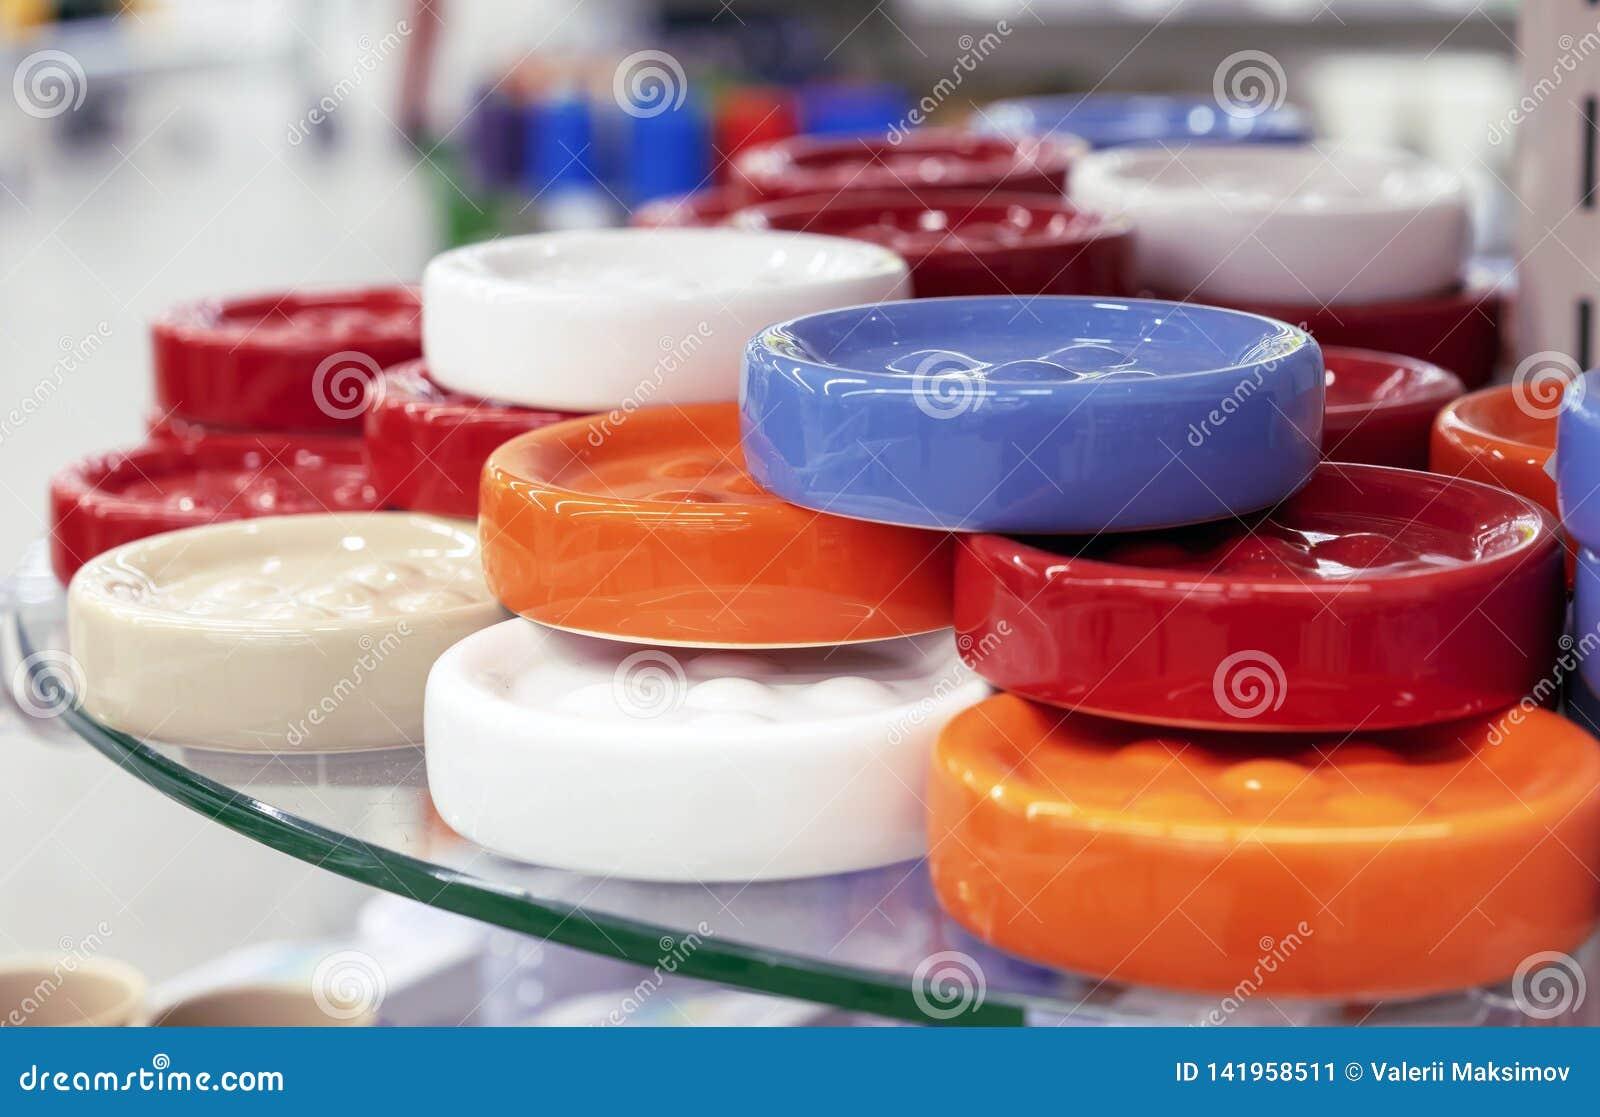 Jaboneras de cerámica redondas de colores brillantes